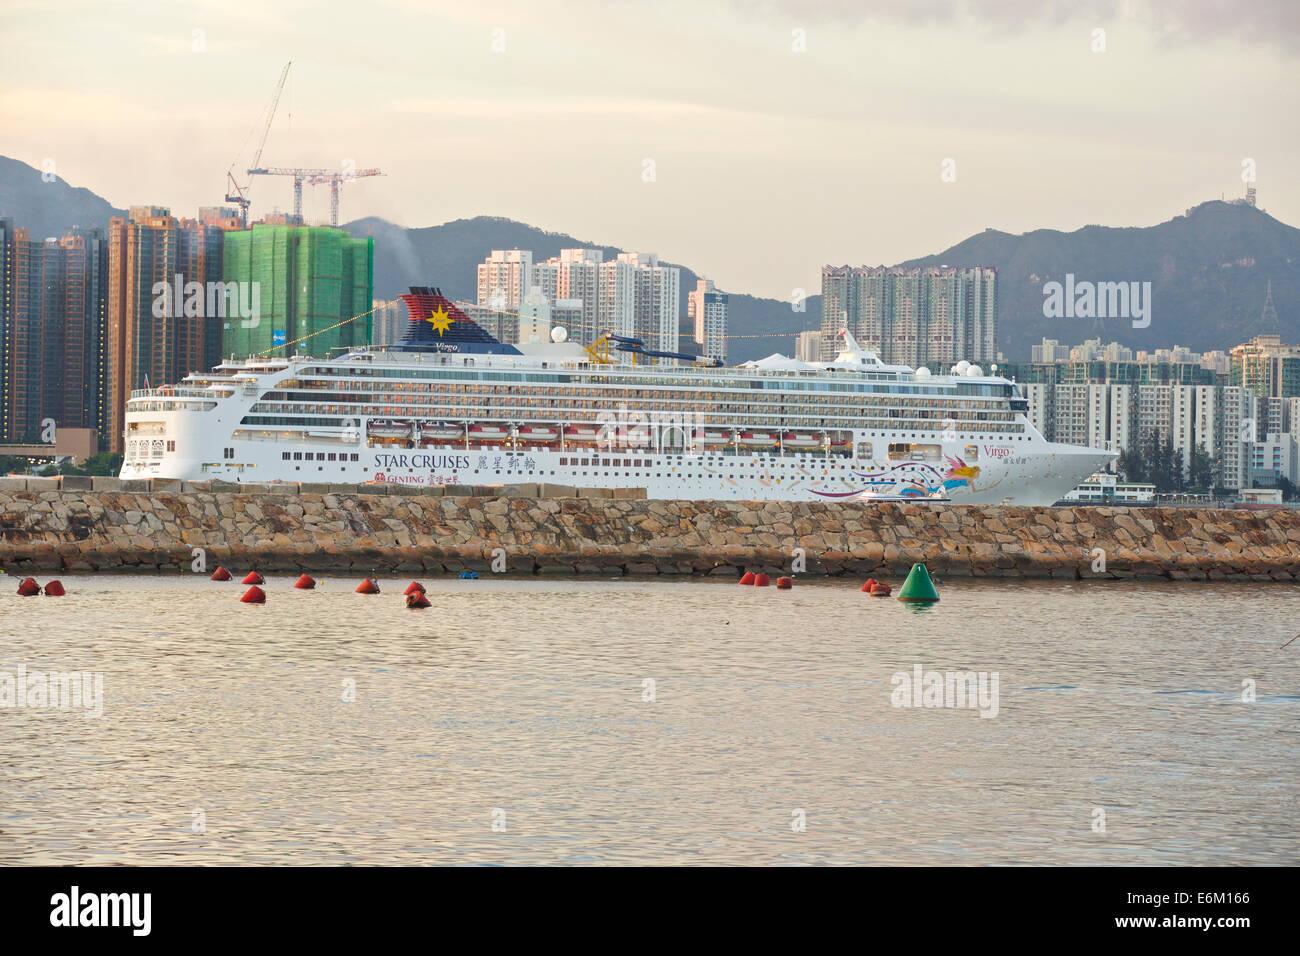 Cruise Ship Steaming Through Victoria Harbour. Causeway Bay, Hong Kong. Stock Photo